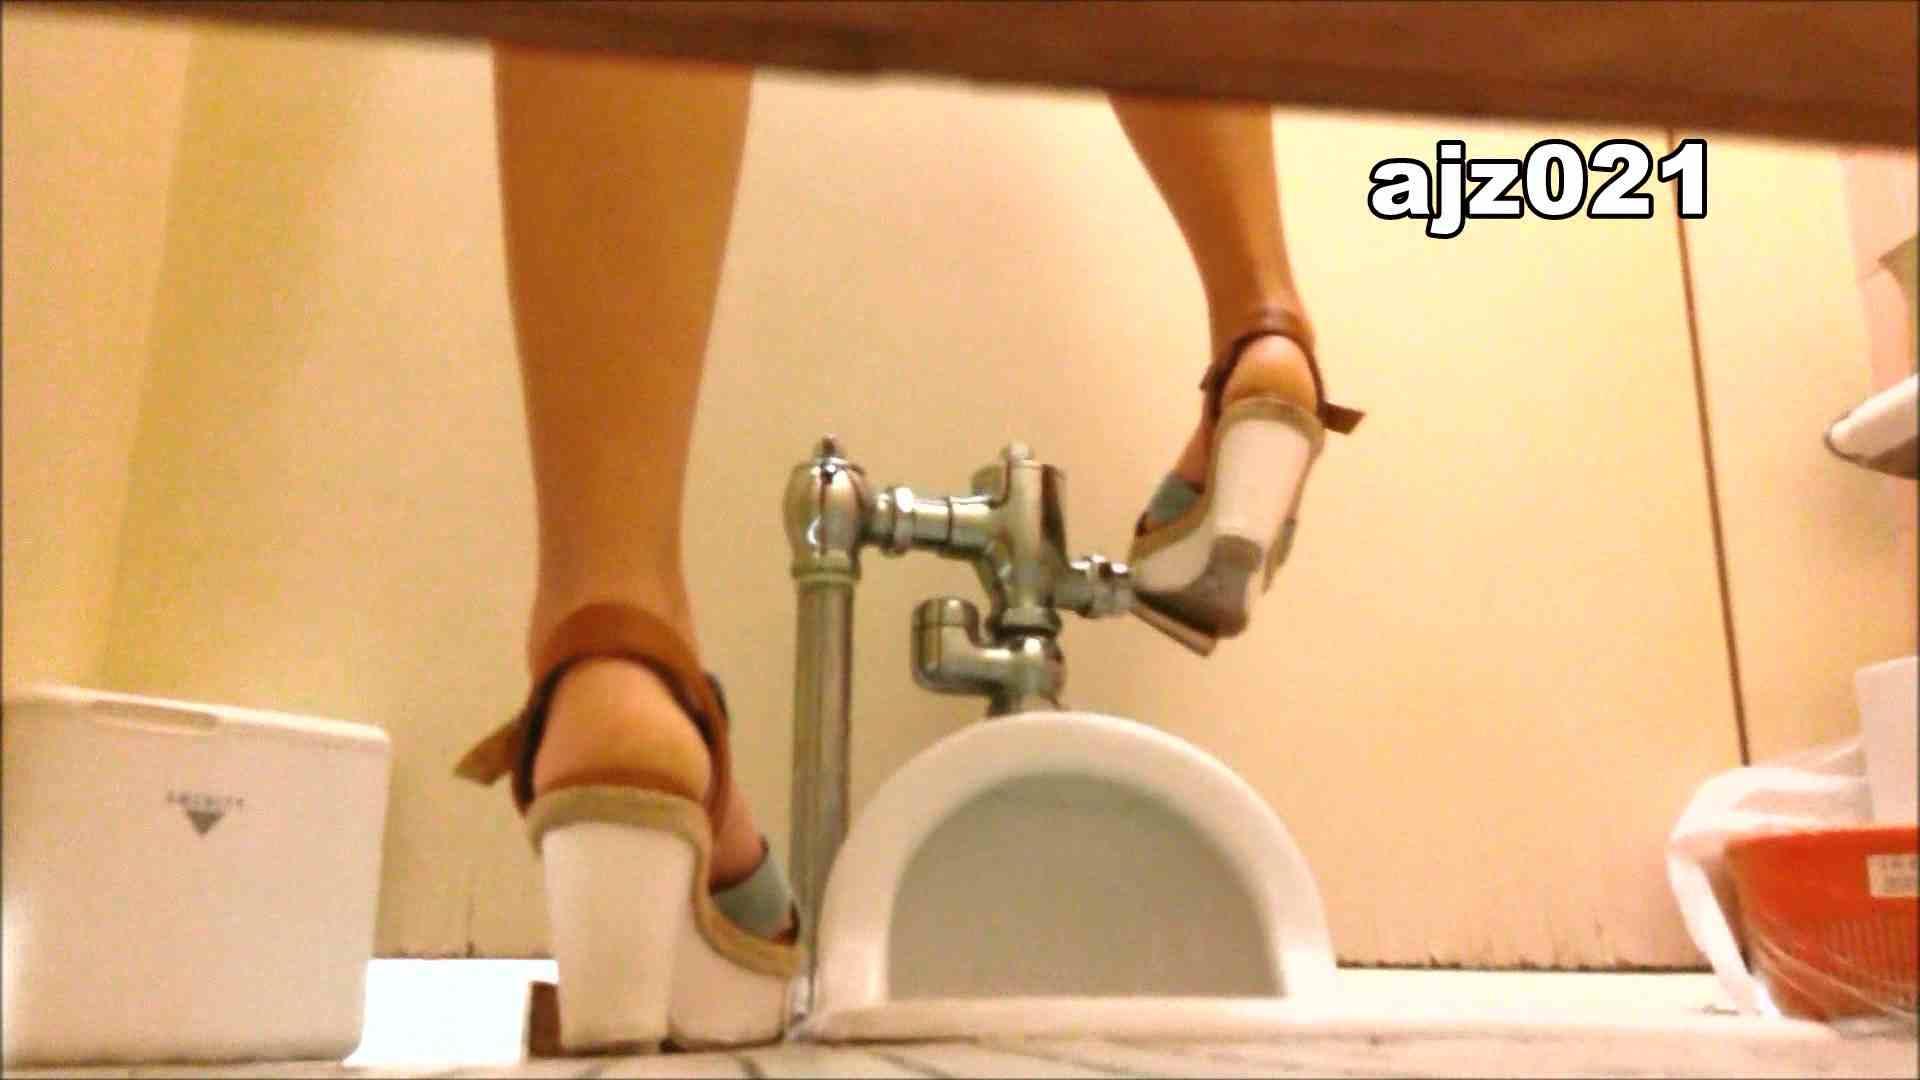 某有名大学女性洗面所 vol.21 美しいOLの裸体 濡れ場動画紹介 91pic 26